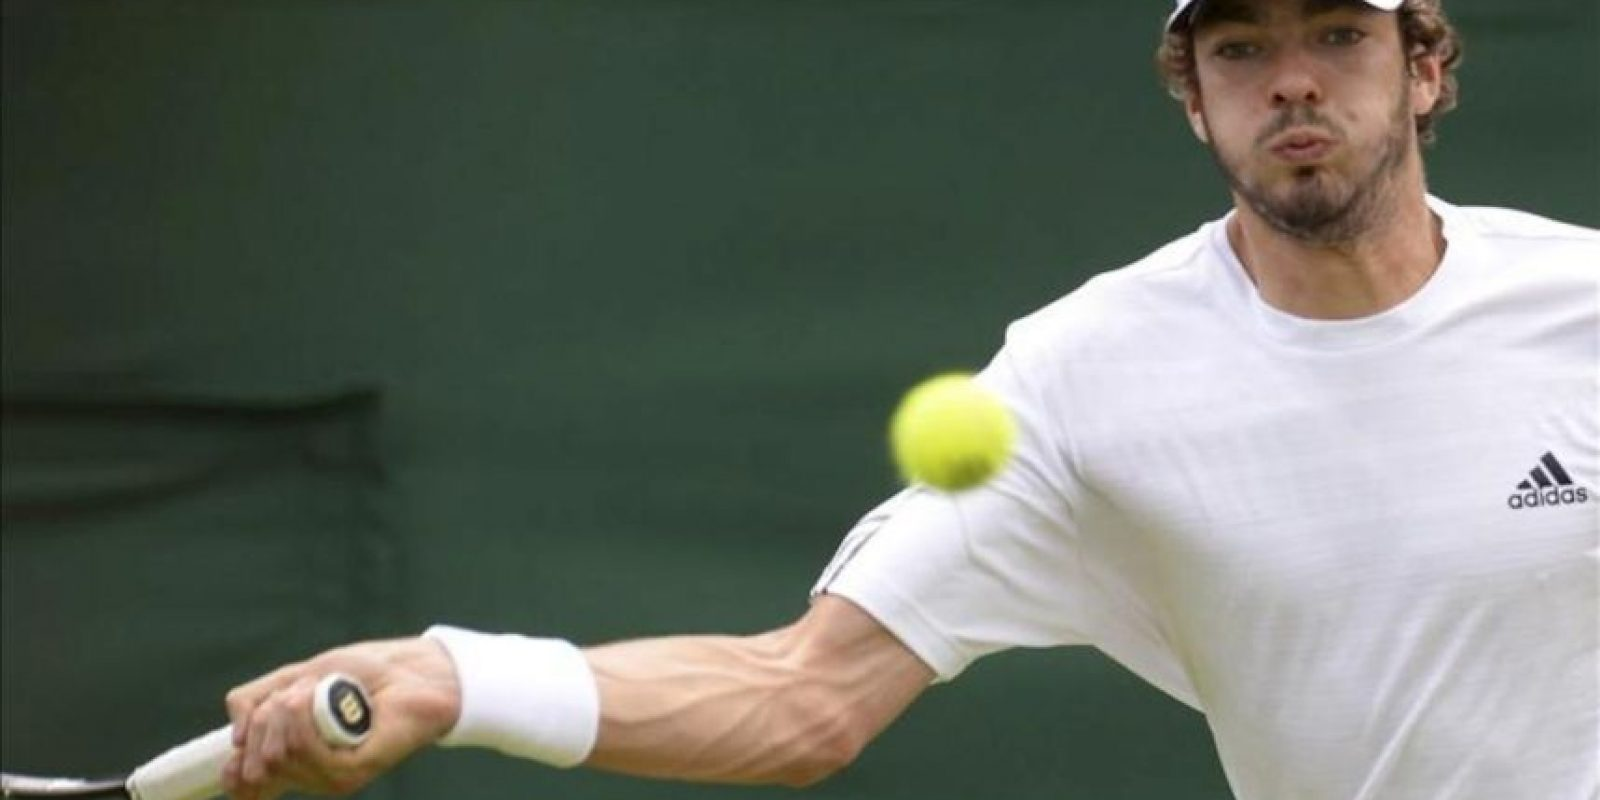 El tenista francés Guillaume Rufin durante su partido de la segunda ronda del Torneo de Wimbledon. EFE